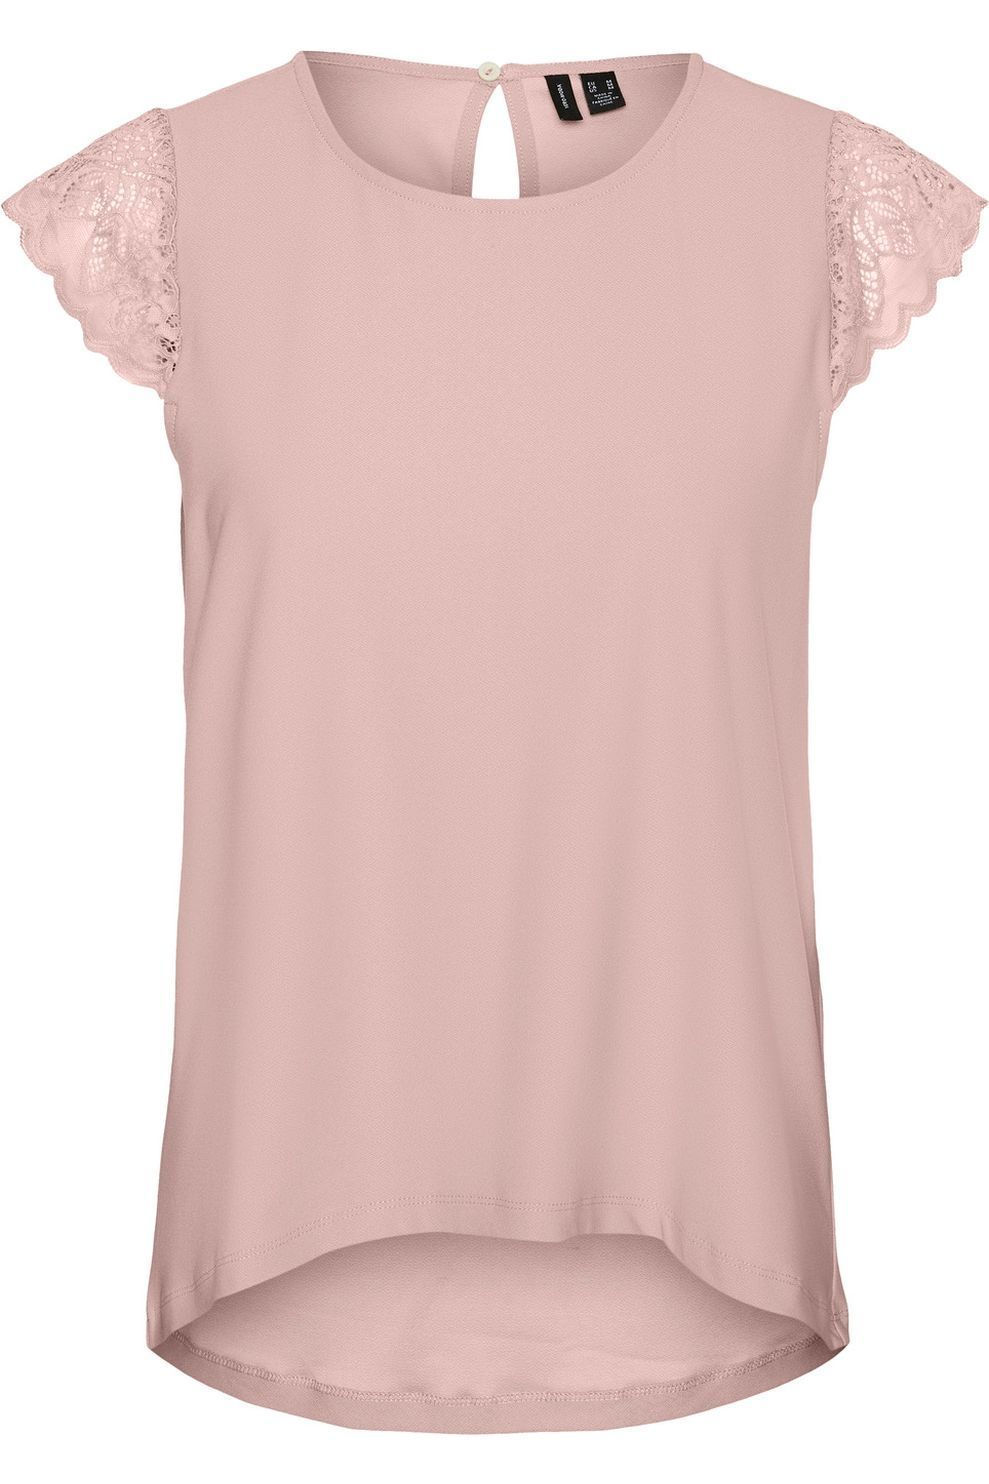 Vero Moda Blouse Vmmilla Cap Sleeve Lace Jrs Ga voor dames - Roze - Maten: XS, S, M, L, XL